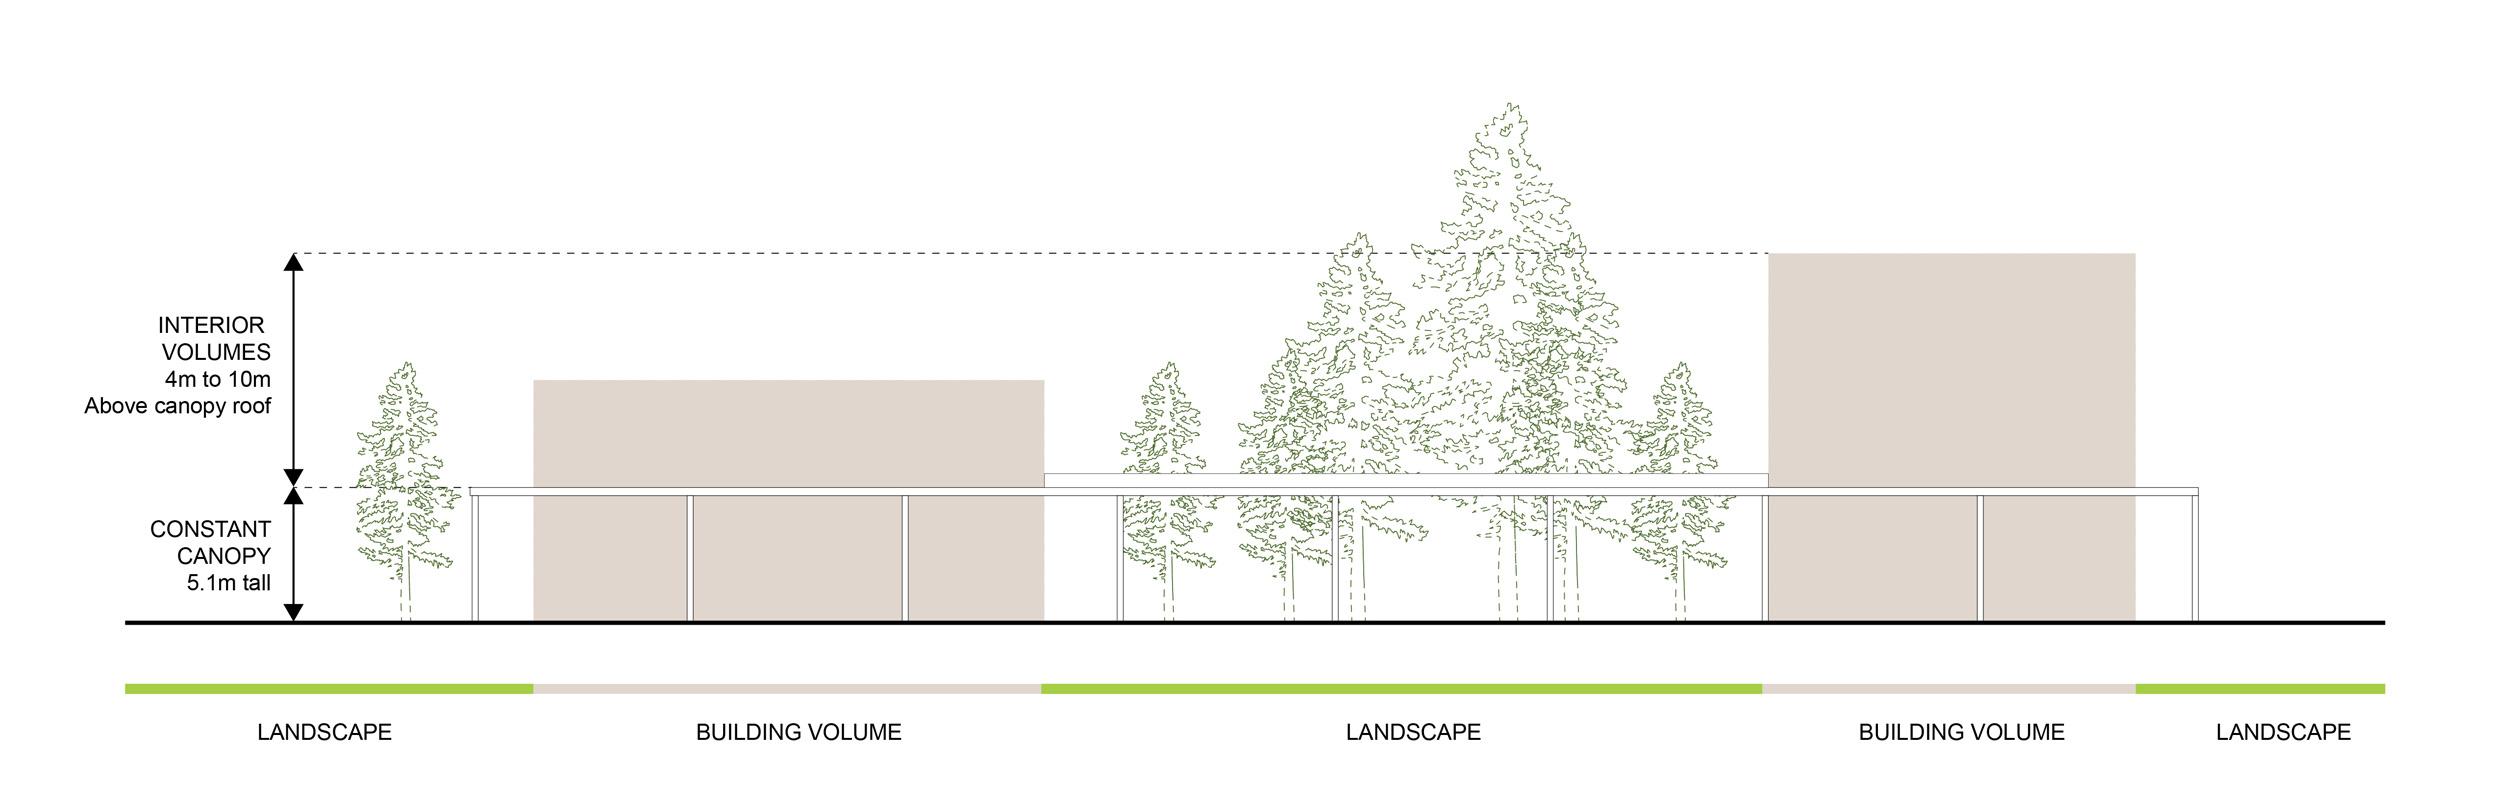 Architectural design - basic formal guidelines